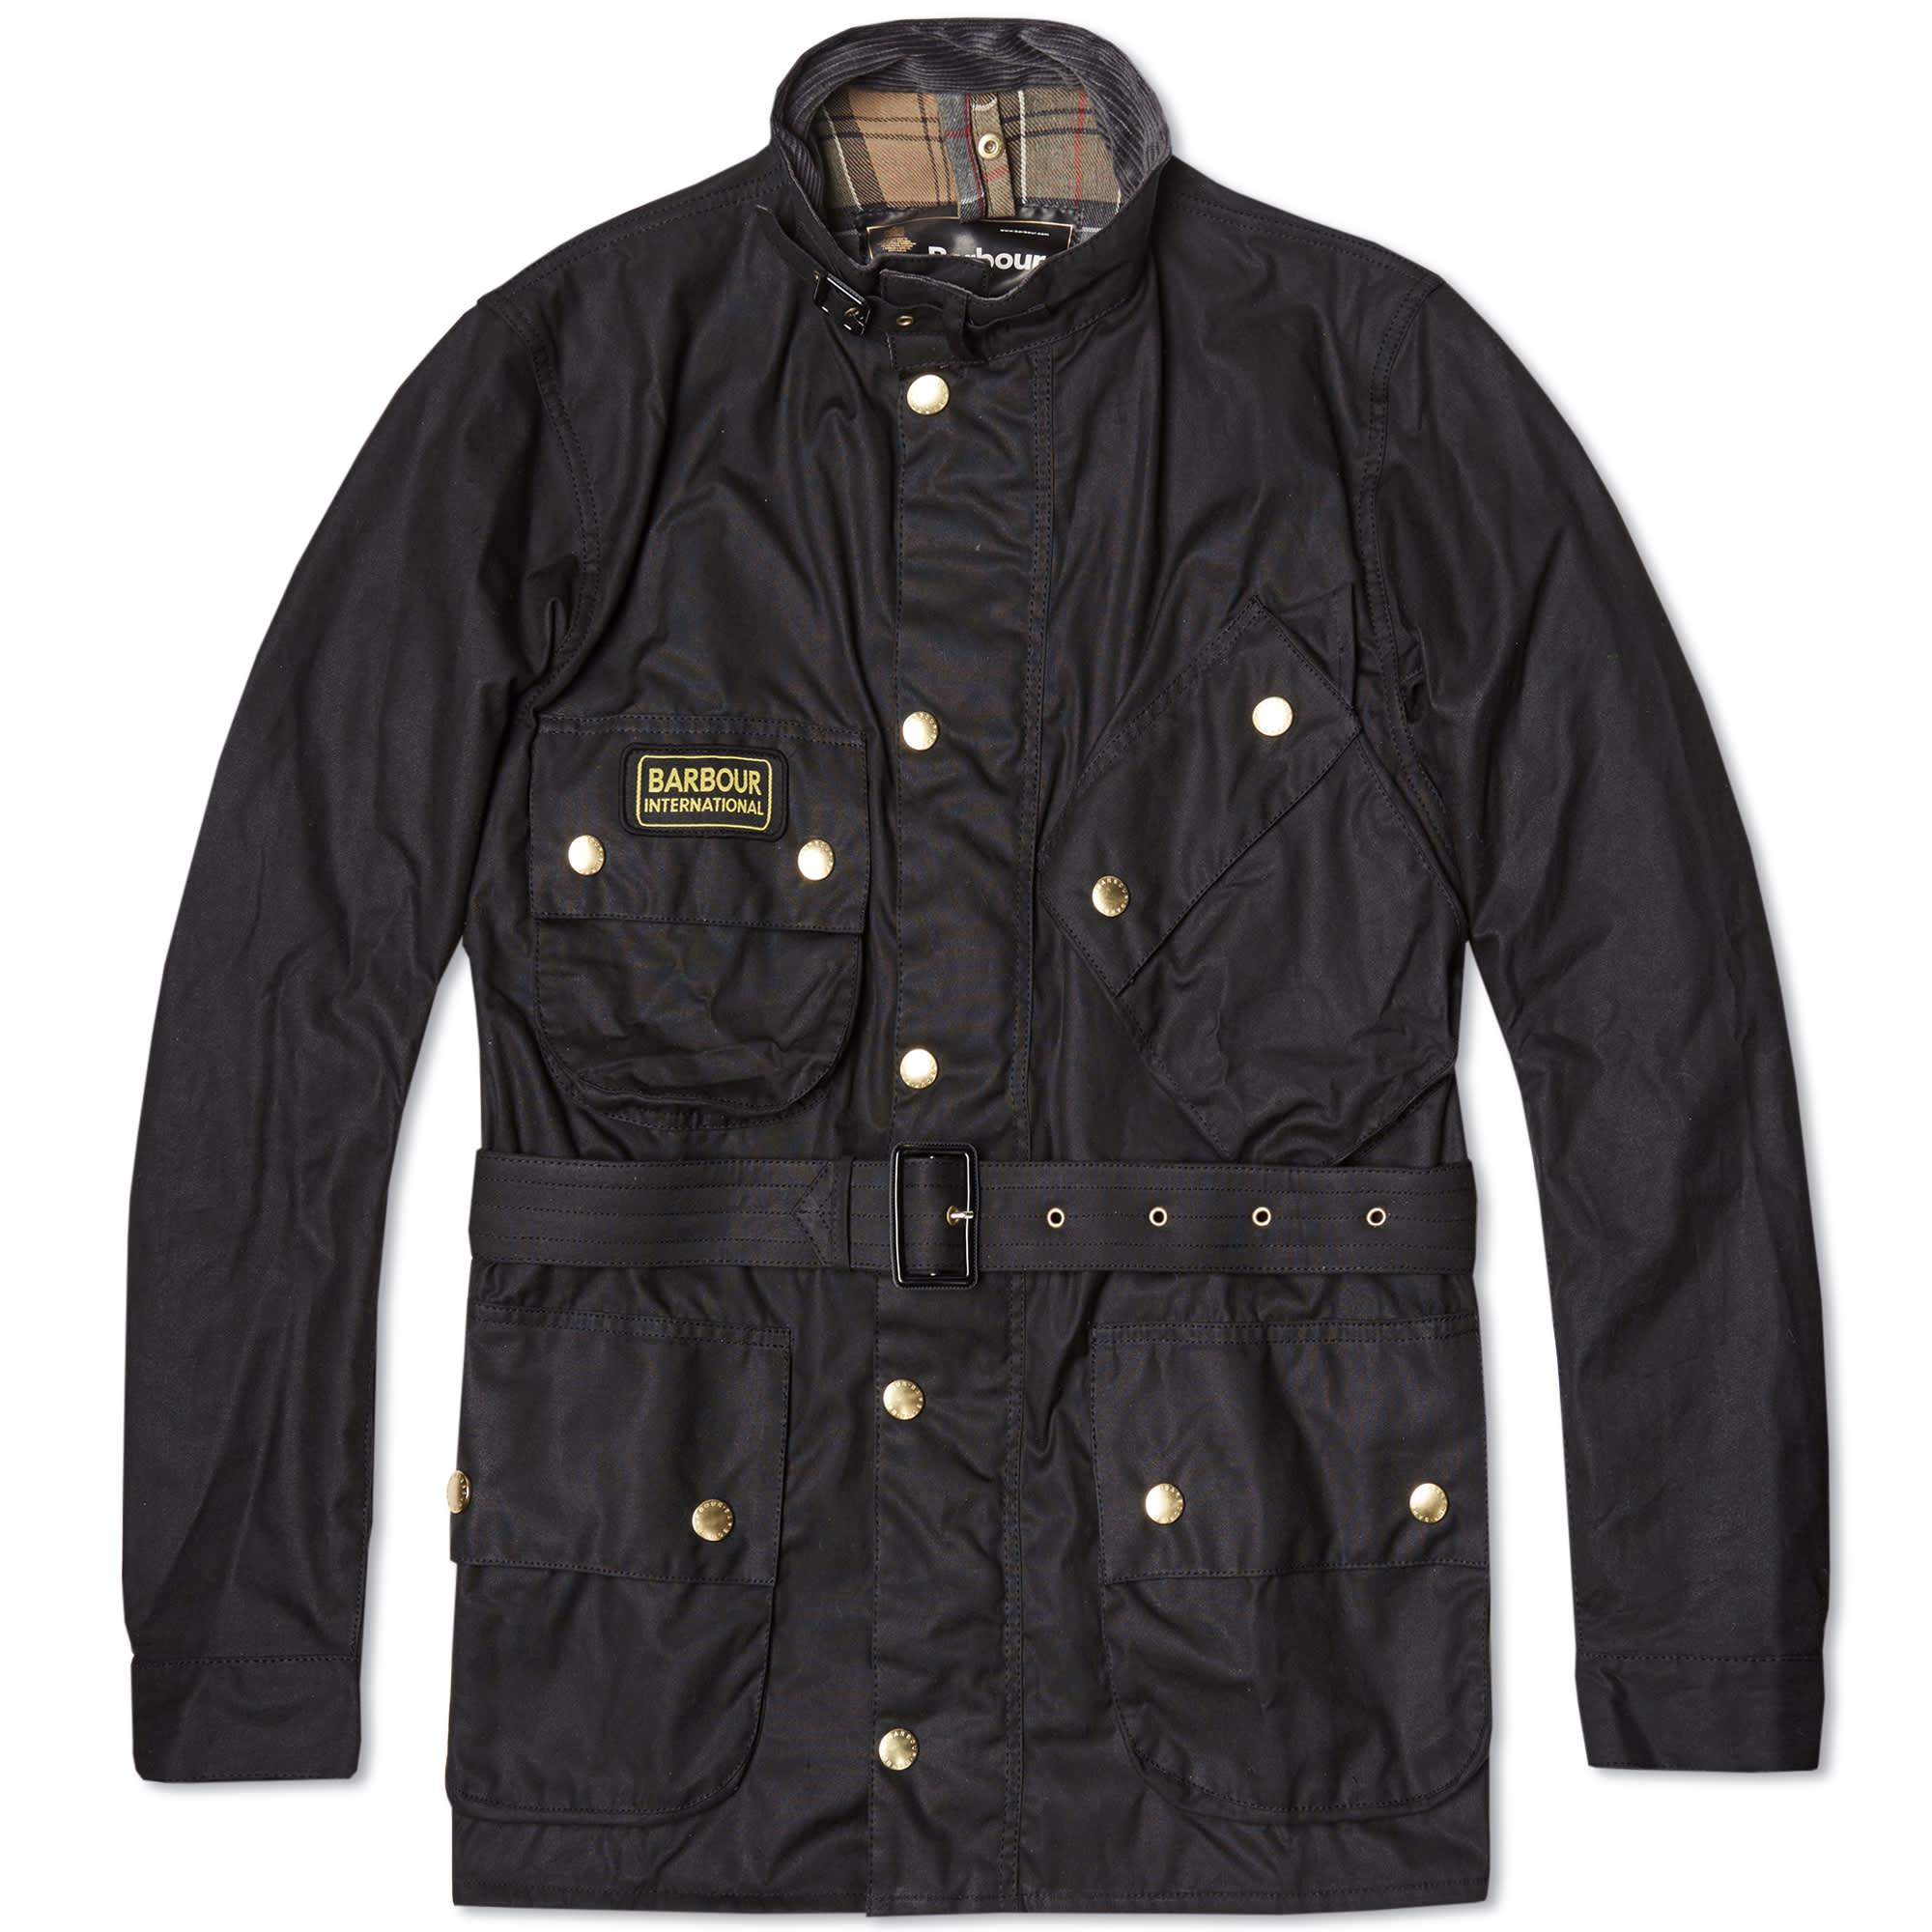 Barbour International Original Jacket - Black